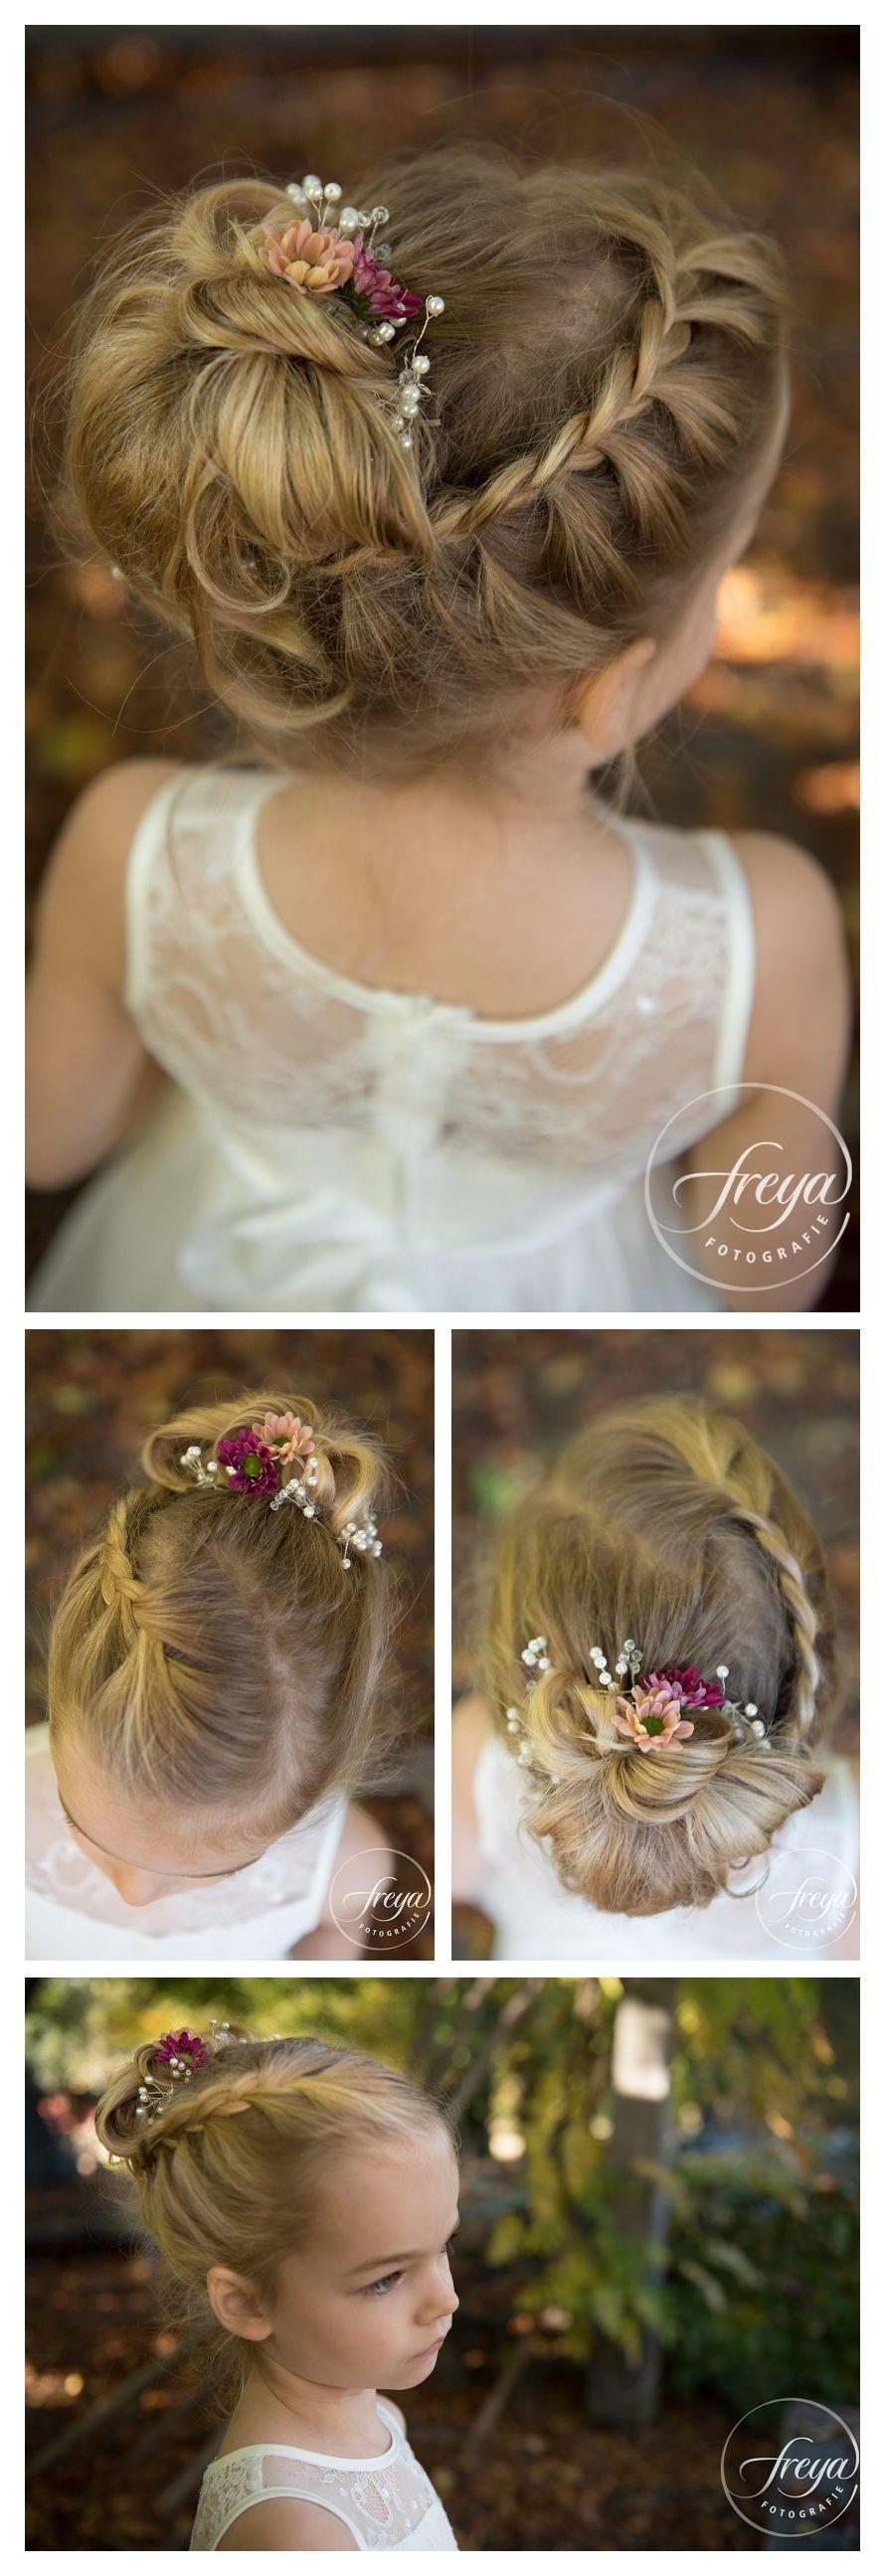 bruidsmeisje kapsel bohemian vintage wedding shoot | braids